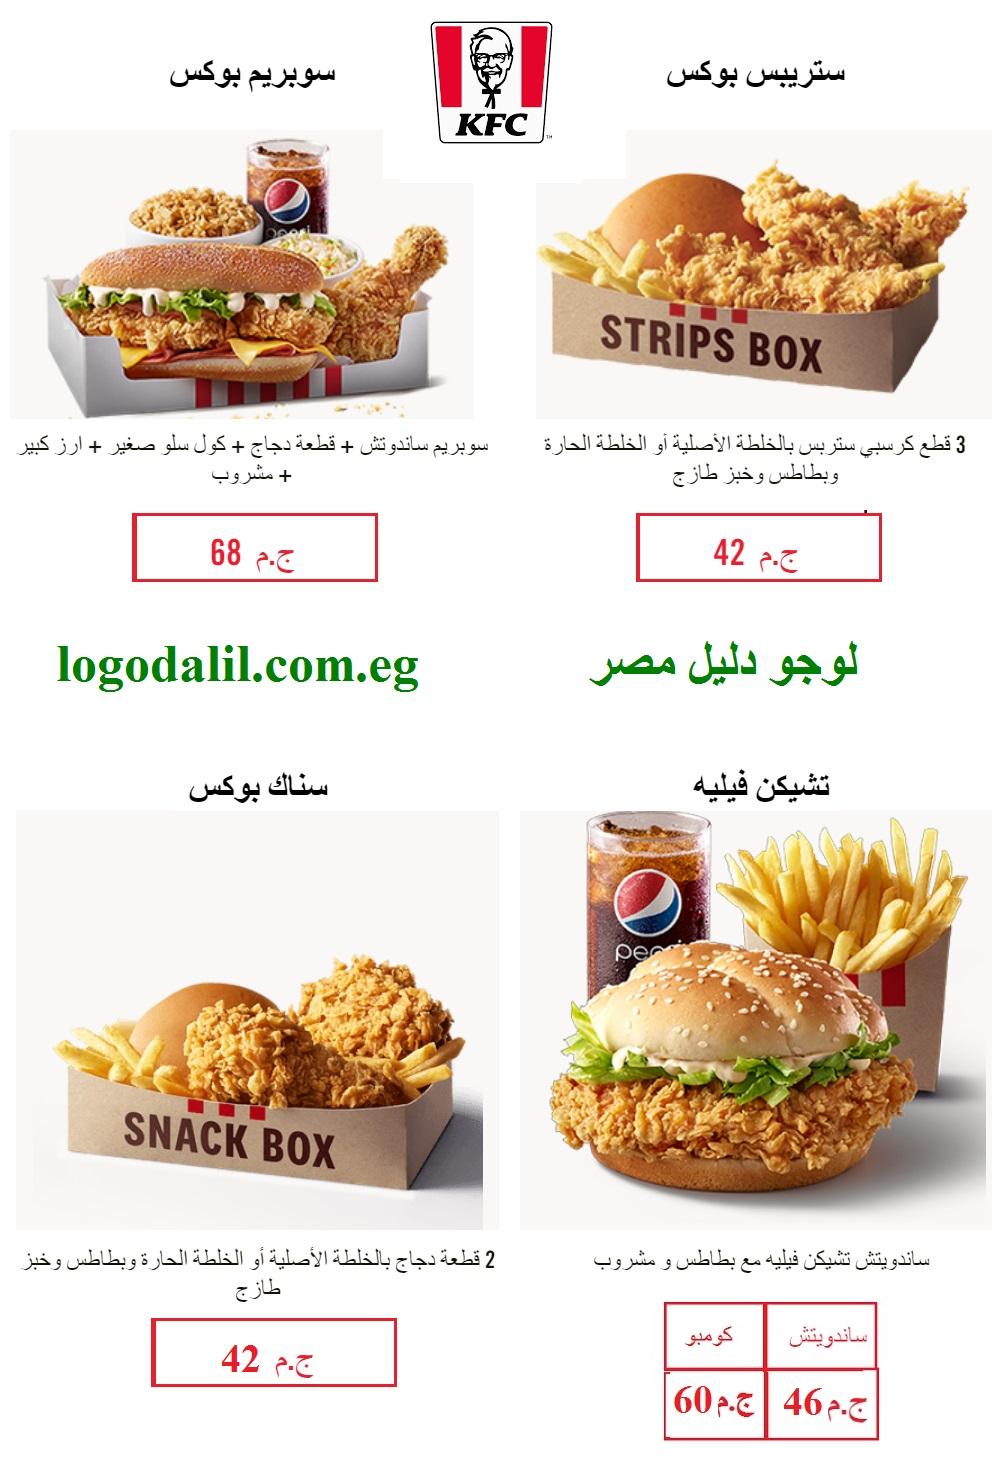 Multinational food companies